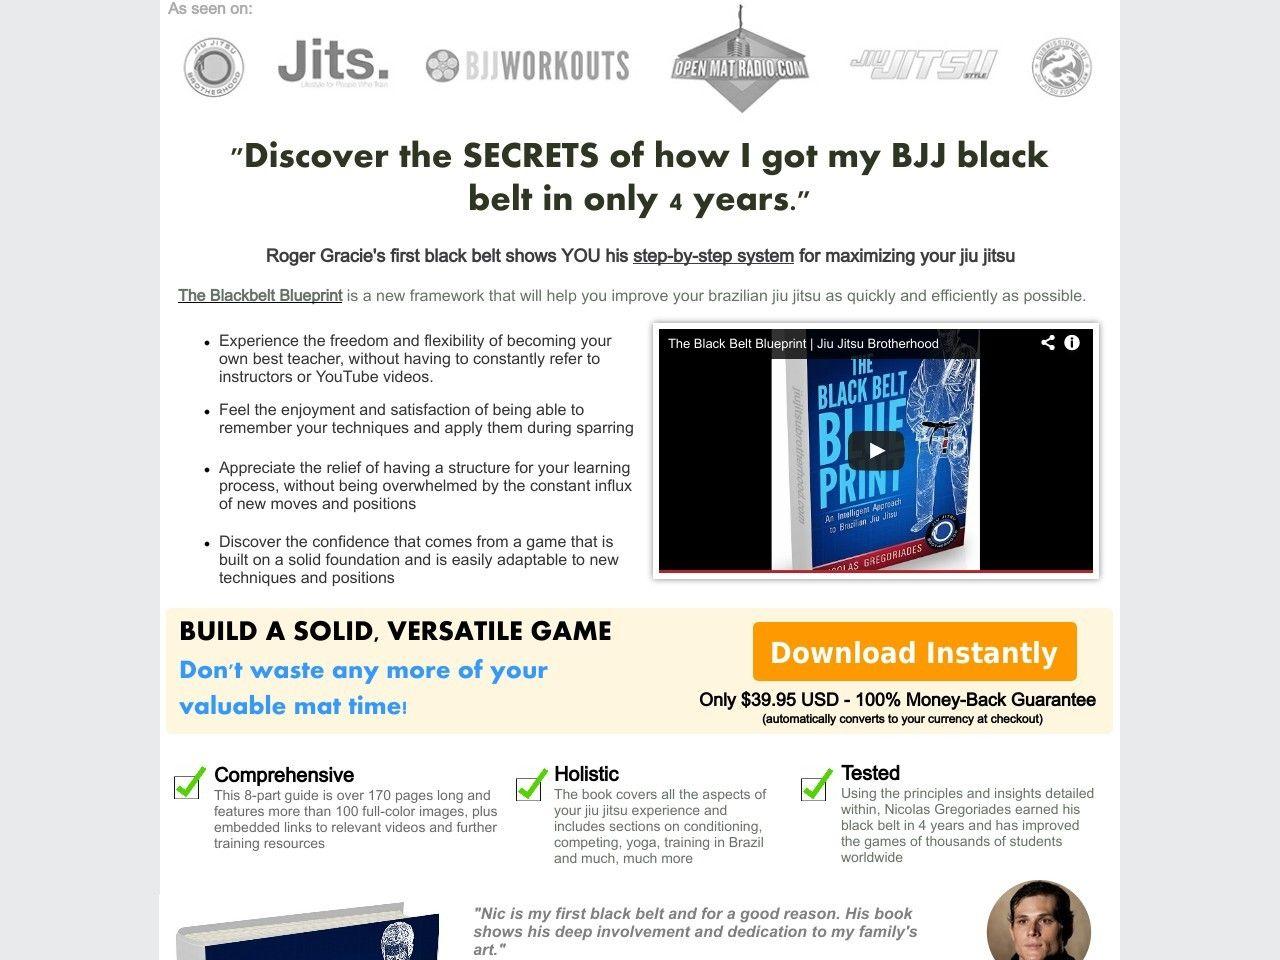 The black belt blueprint review get full review httplanding the black belt blueprint review get full review httplanding squeeze malvernweather Gallery